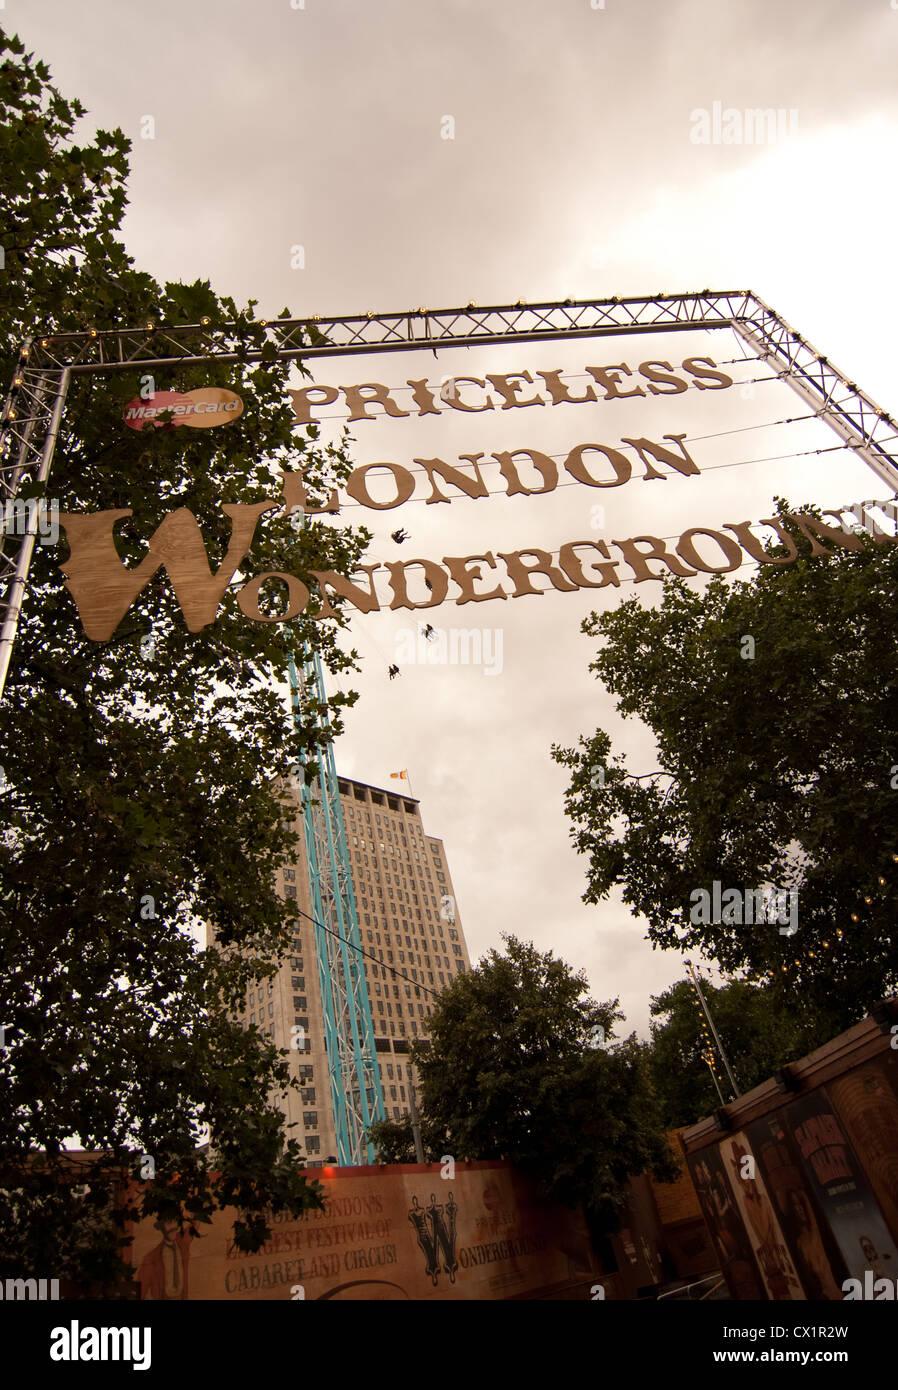 the entrance to the  Priceless London Wonderground fun fair south bank. - Stock Image